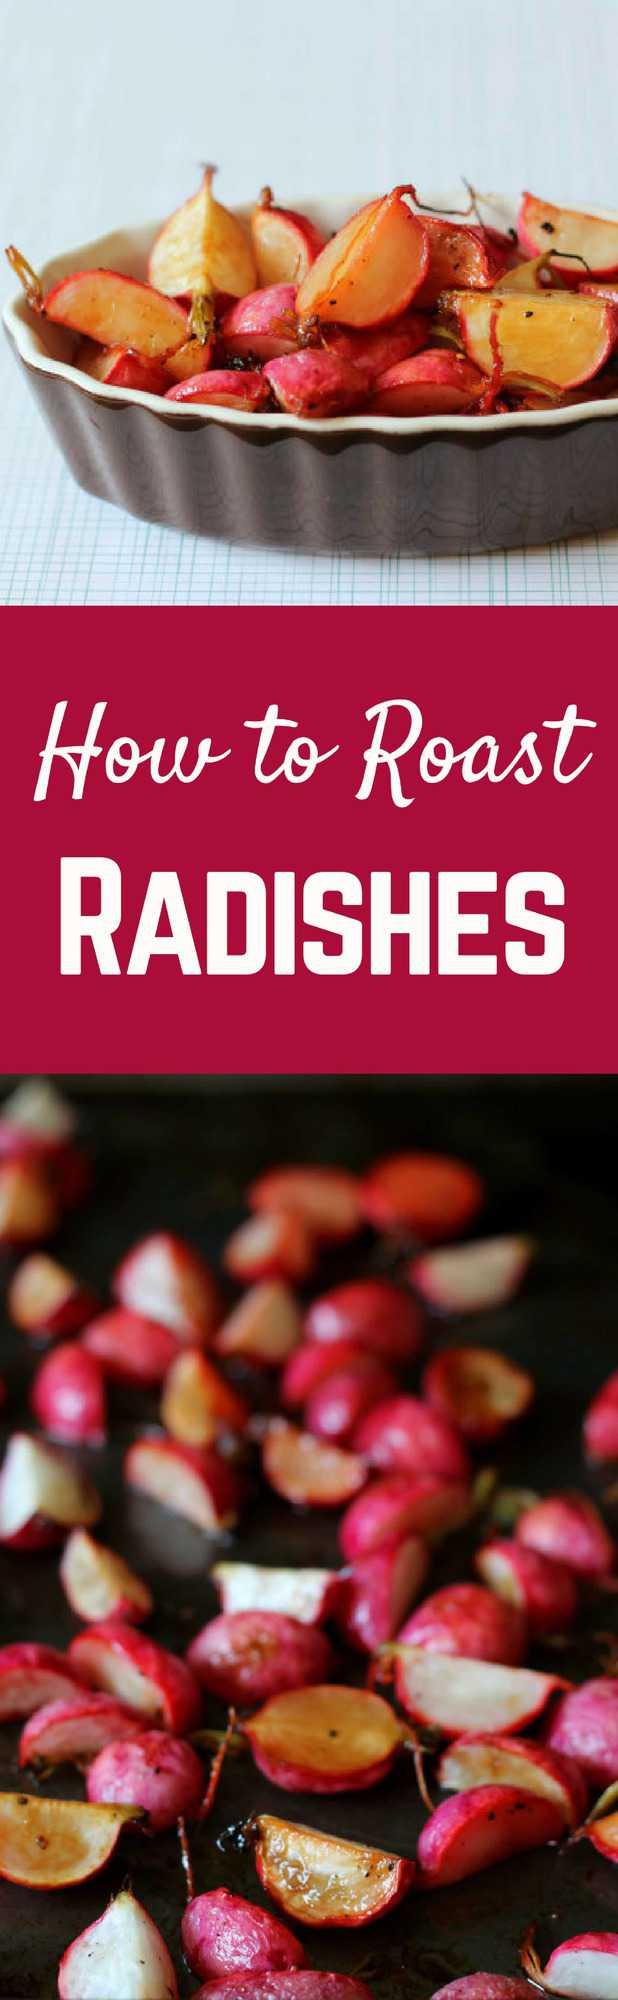 How to Roast Radishes on RachelCooks.com